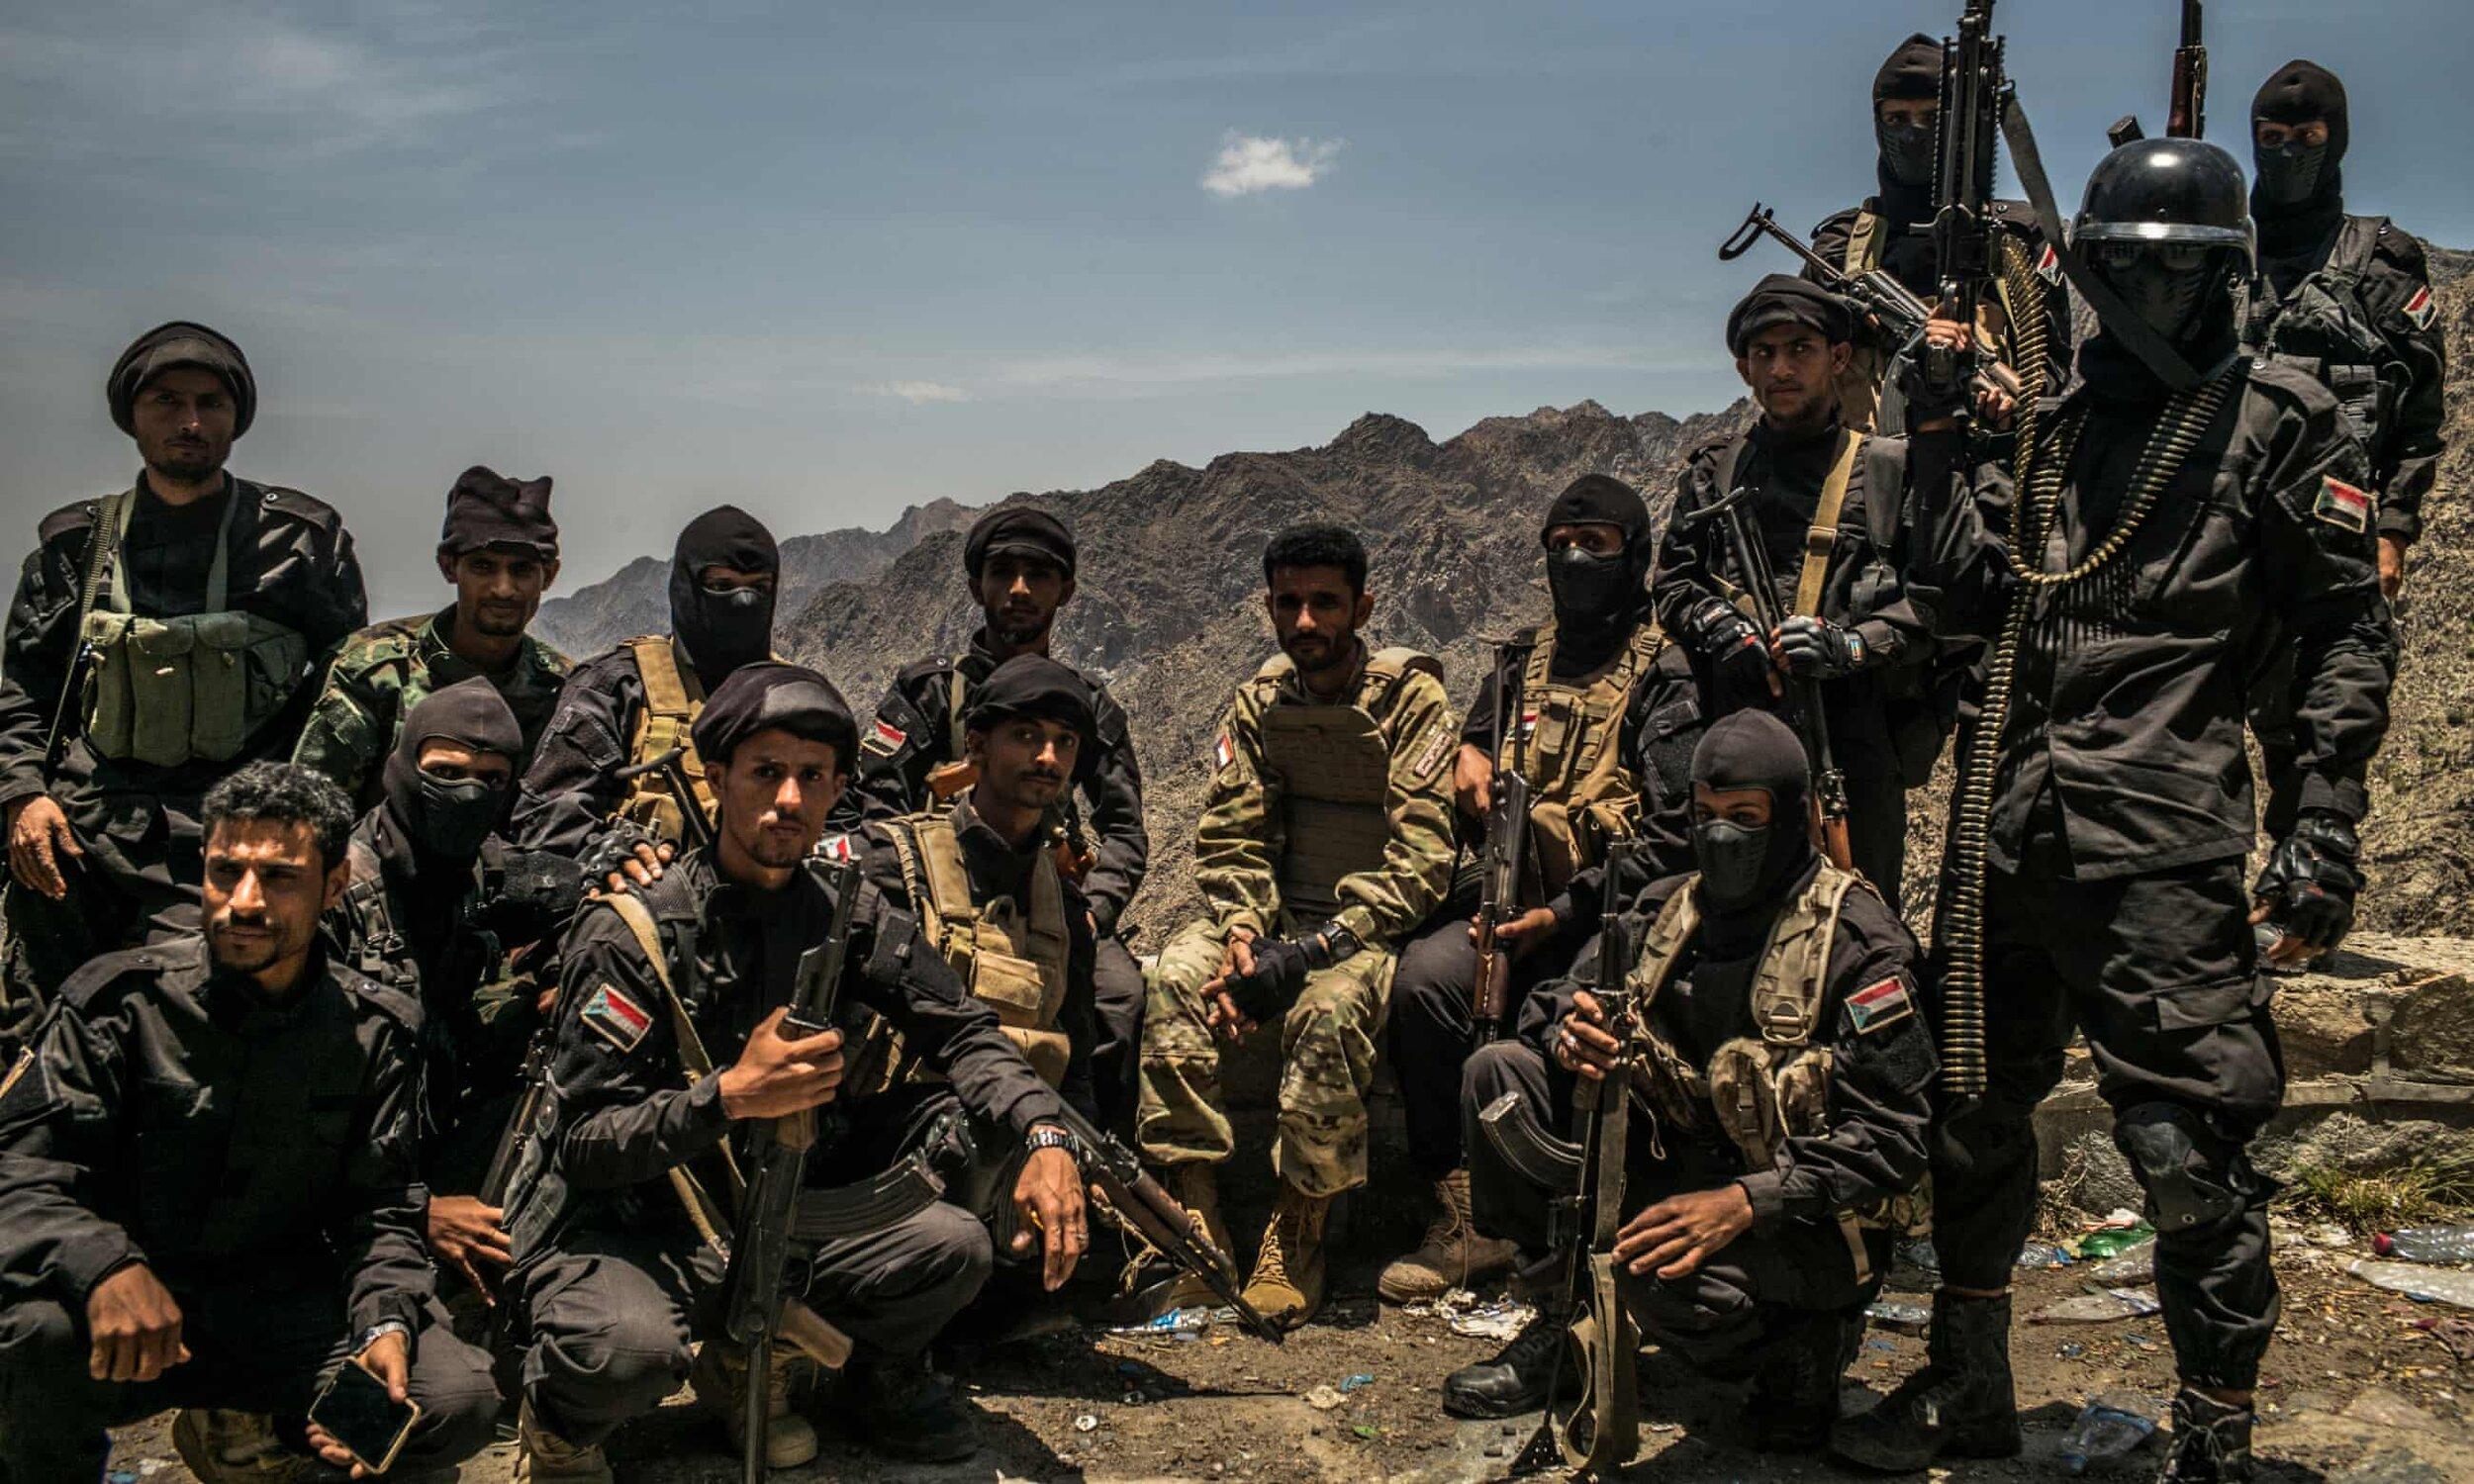 The UAE-backed Security Belt militia near their base north of Aden, Yemen. (Ghaith Abdul-Ahad/The Guardian)